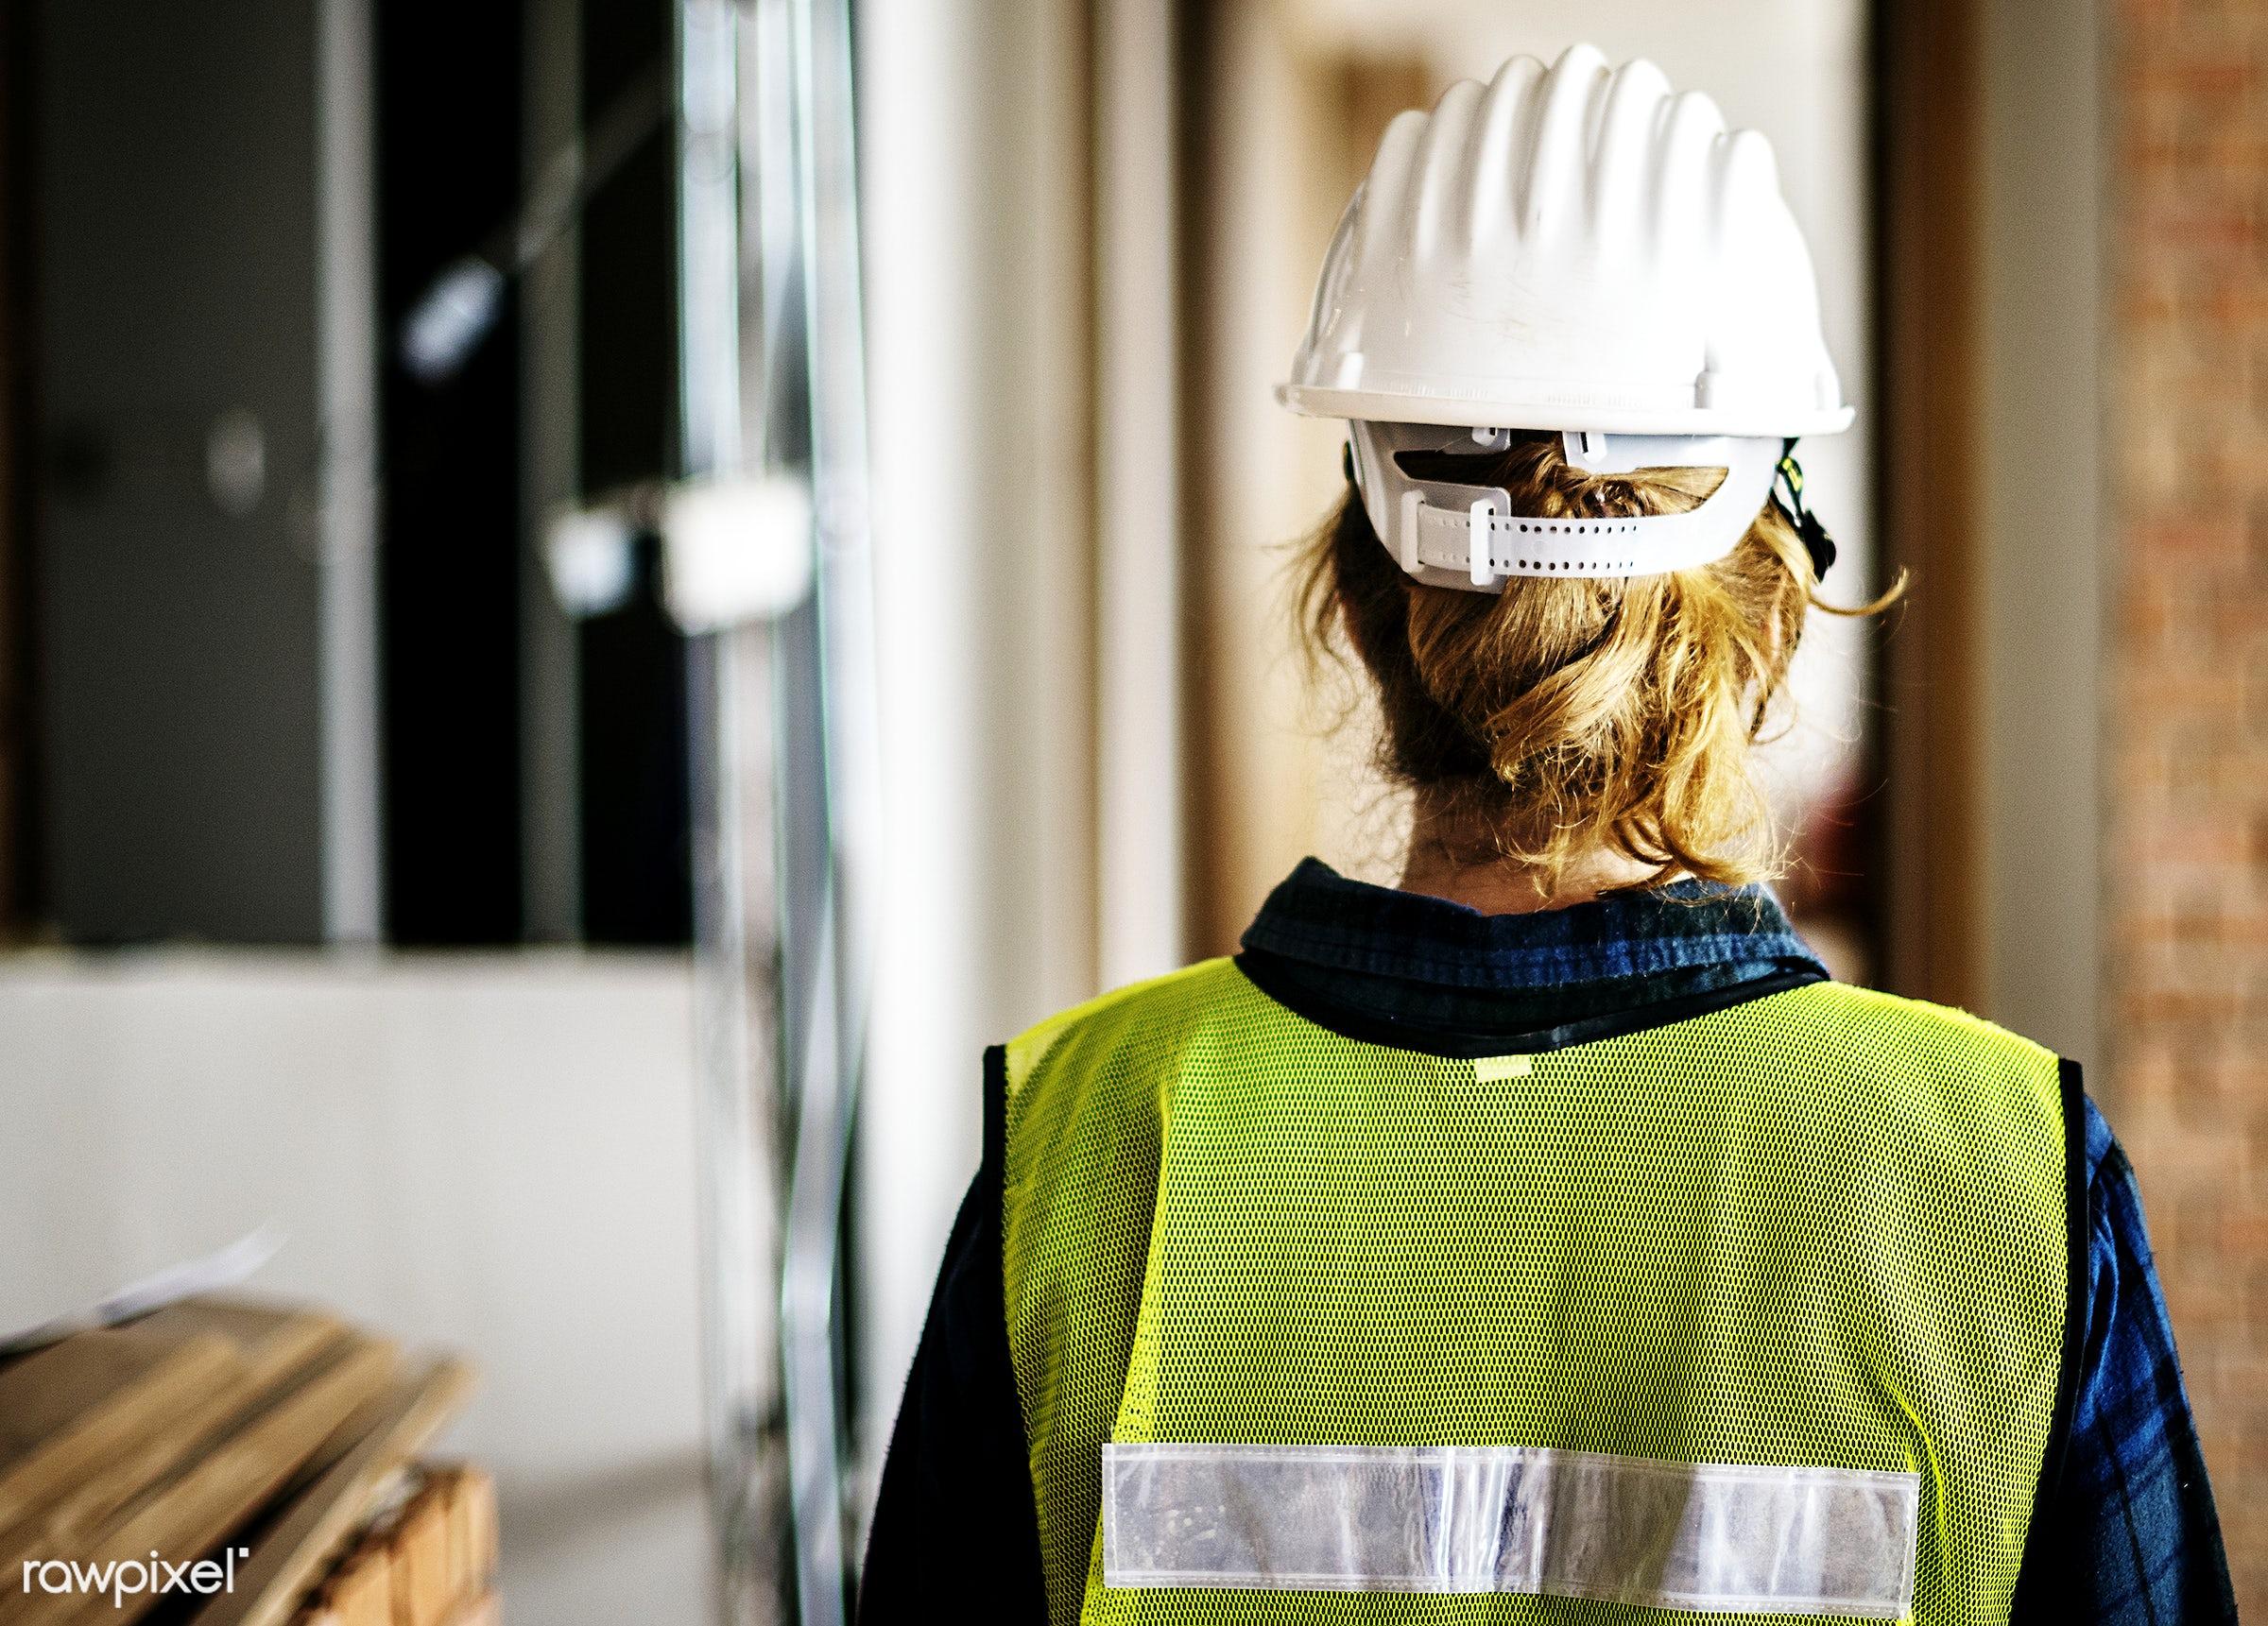 home, technician, development, clothing, tool, equipment, house, security, helmet, engineering, installation, repairman,...